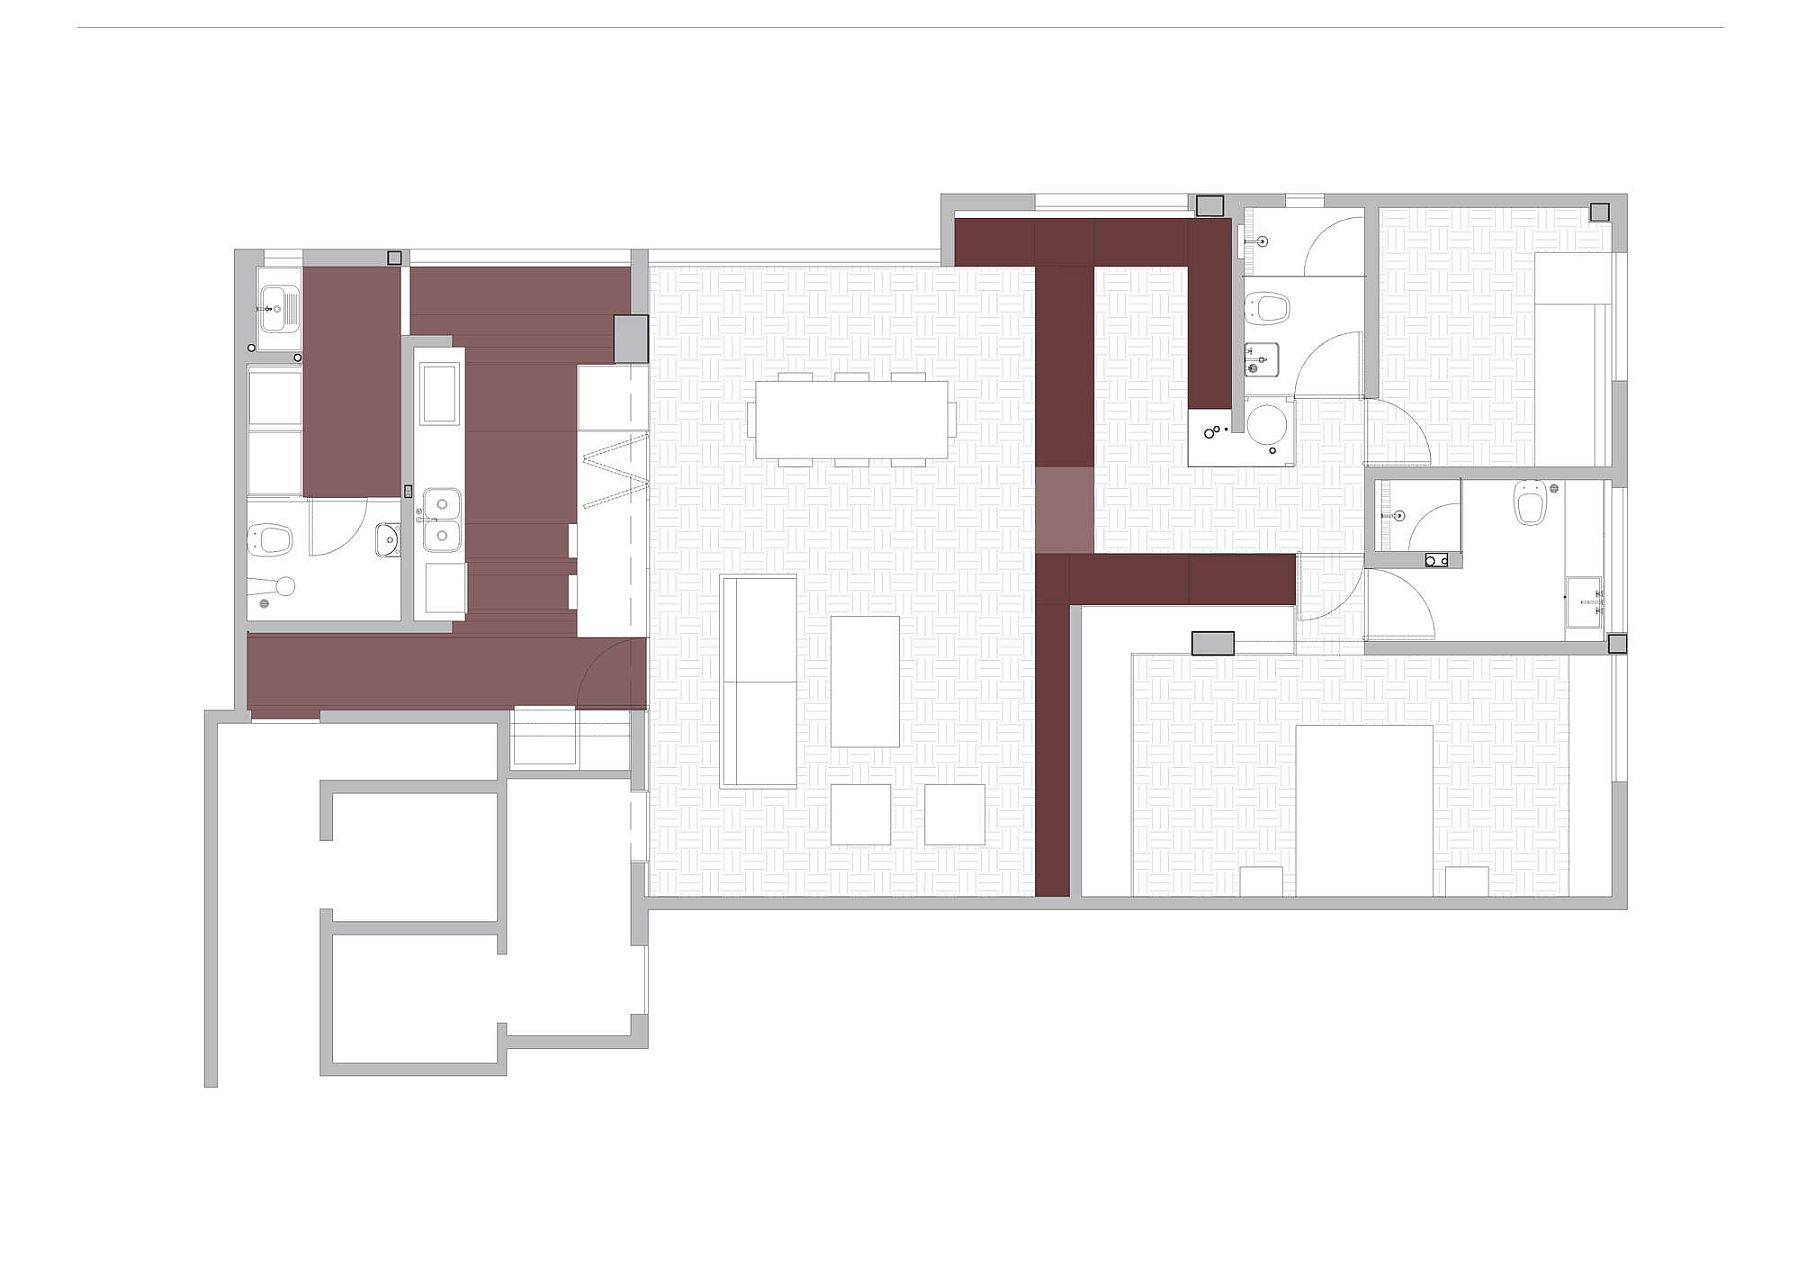 Revamped-floor-plan-of-the-terracota-apartment